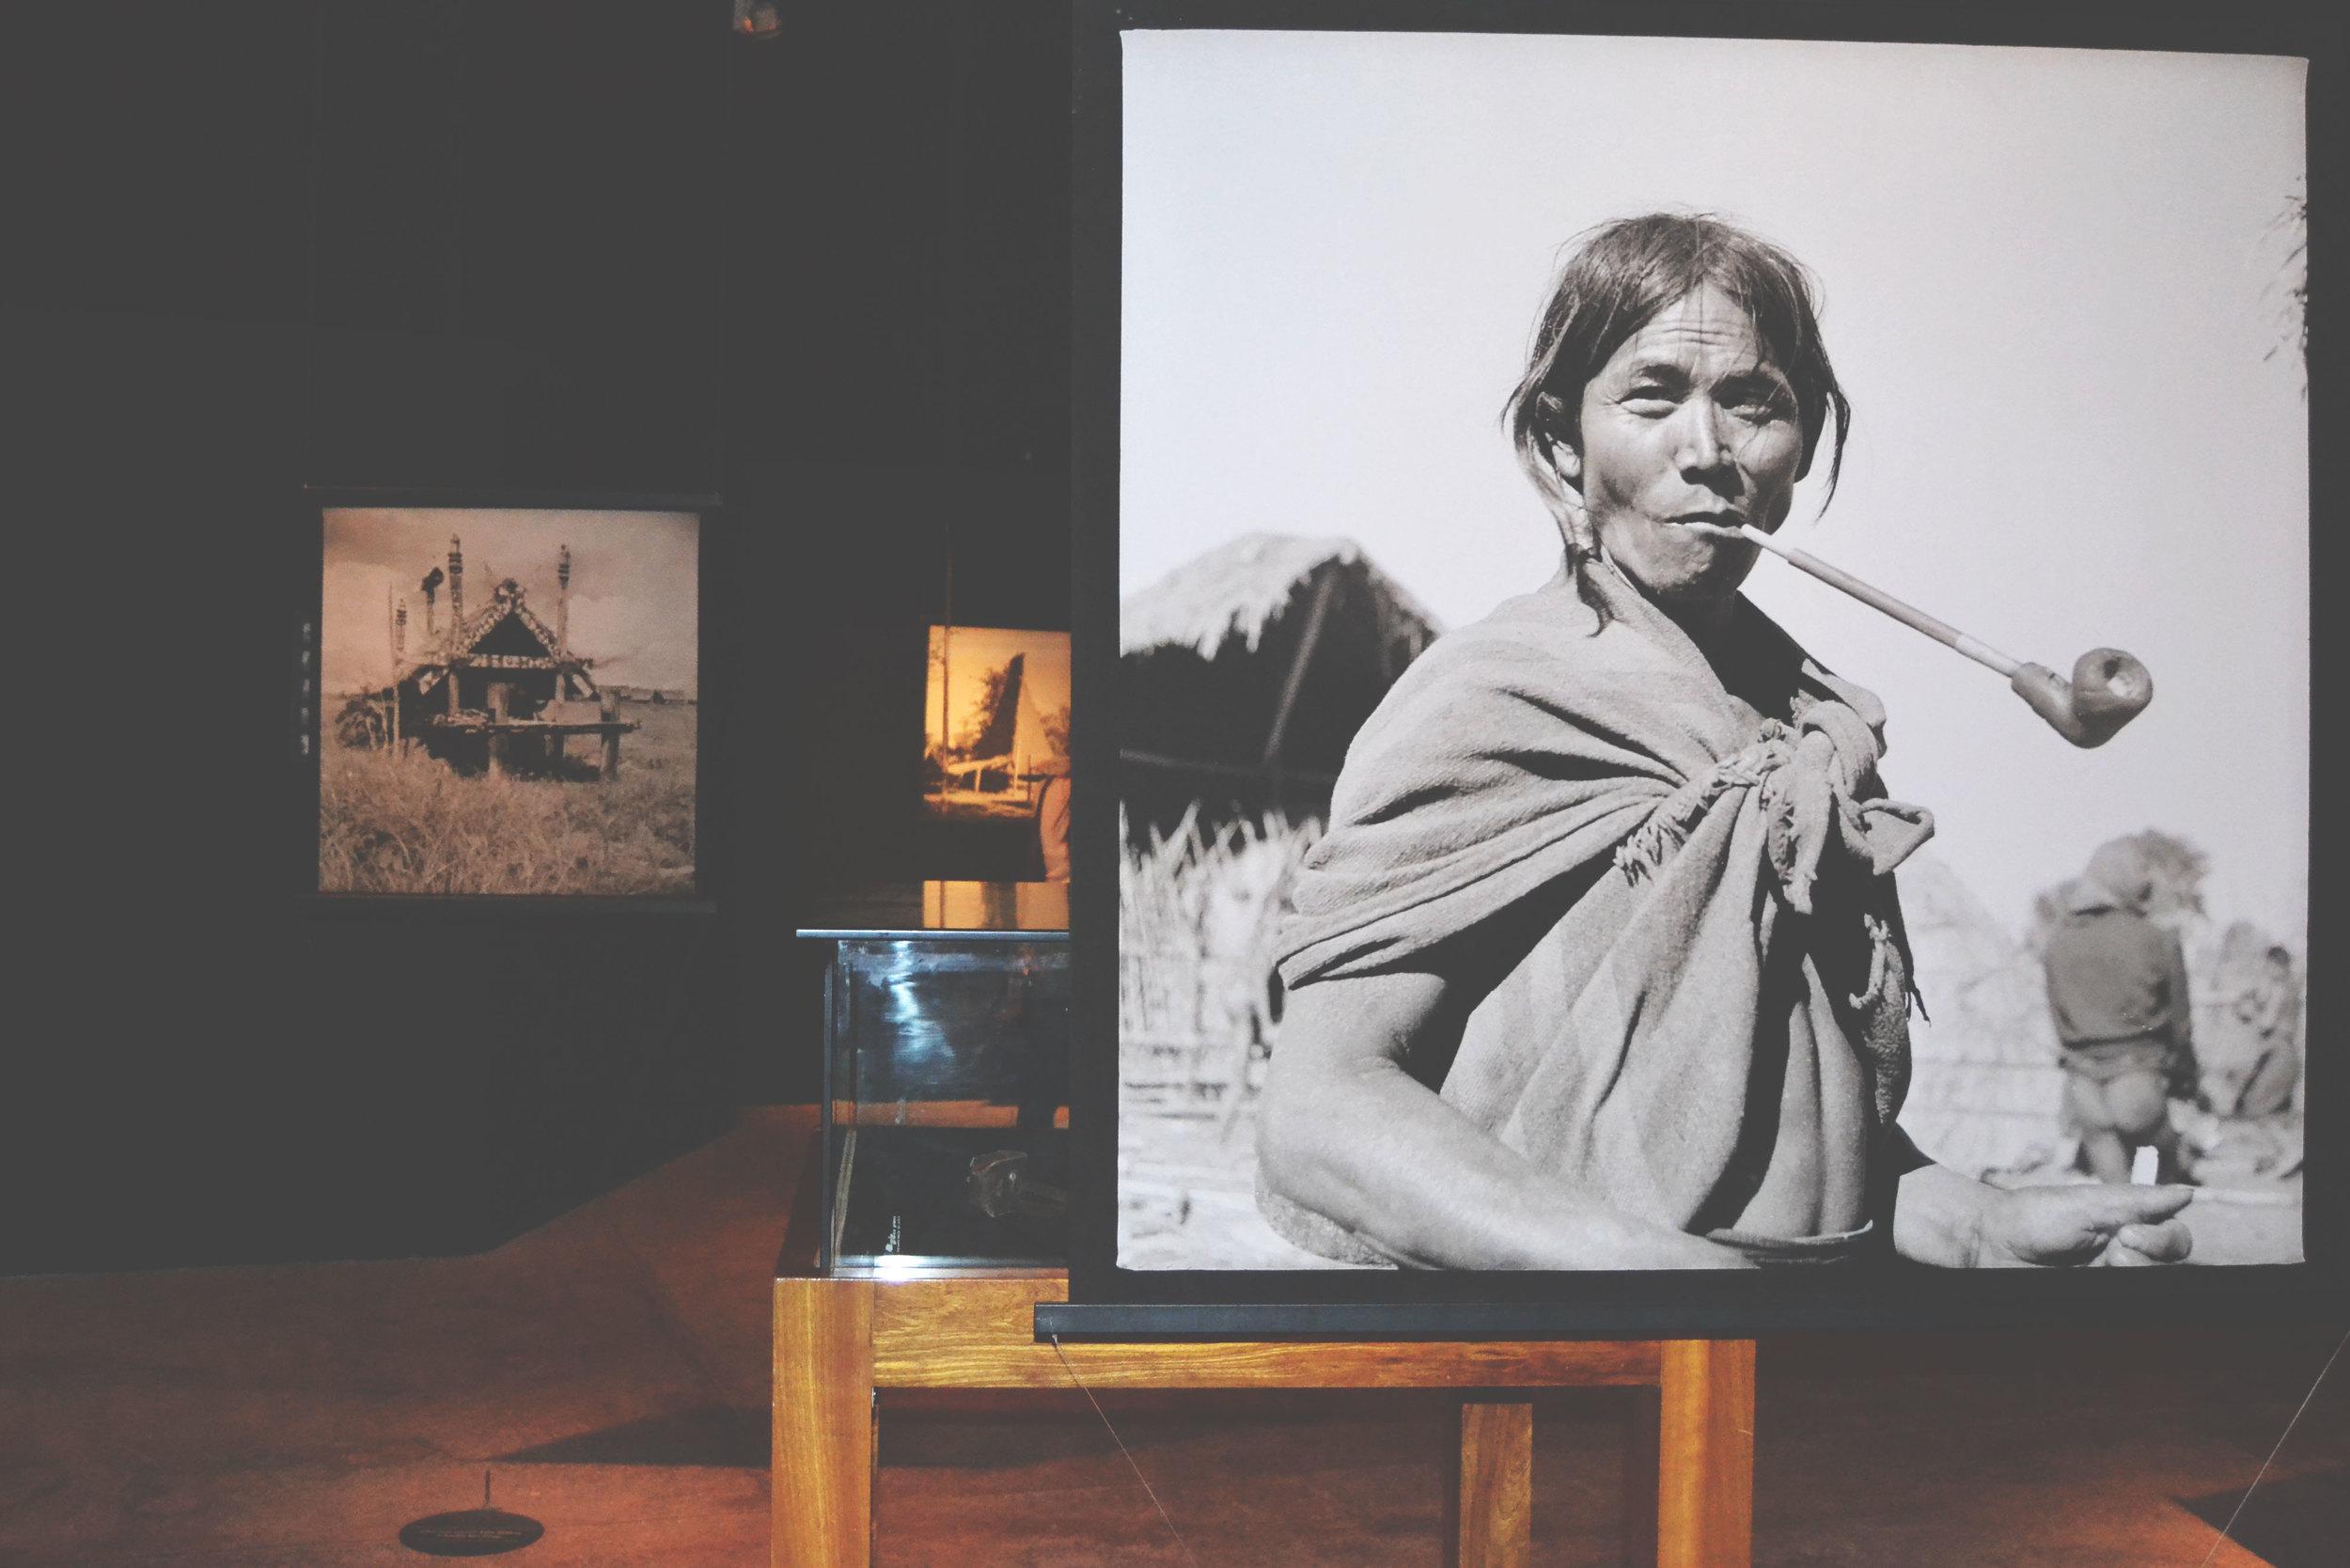 Hanoi - Expo photo musée Ethnographie - Wonderluhsters